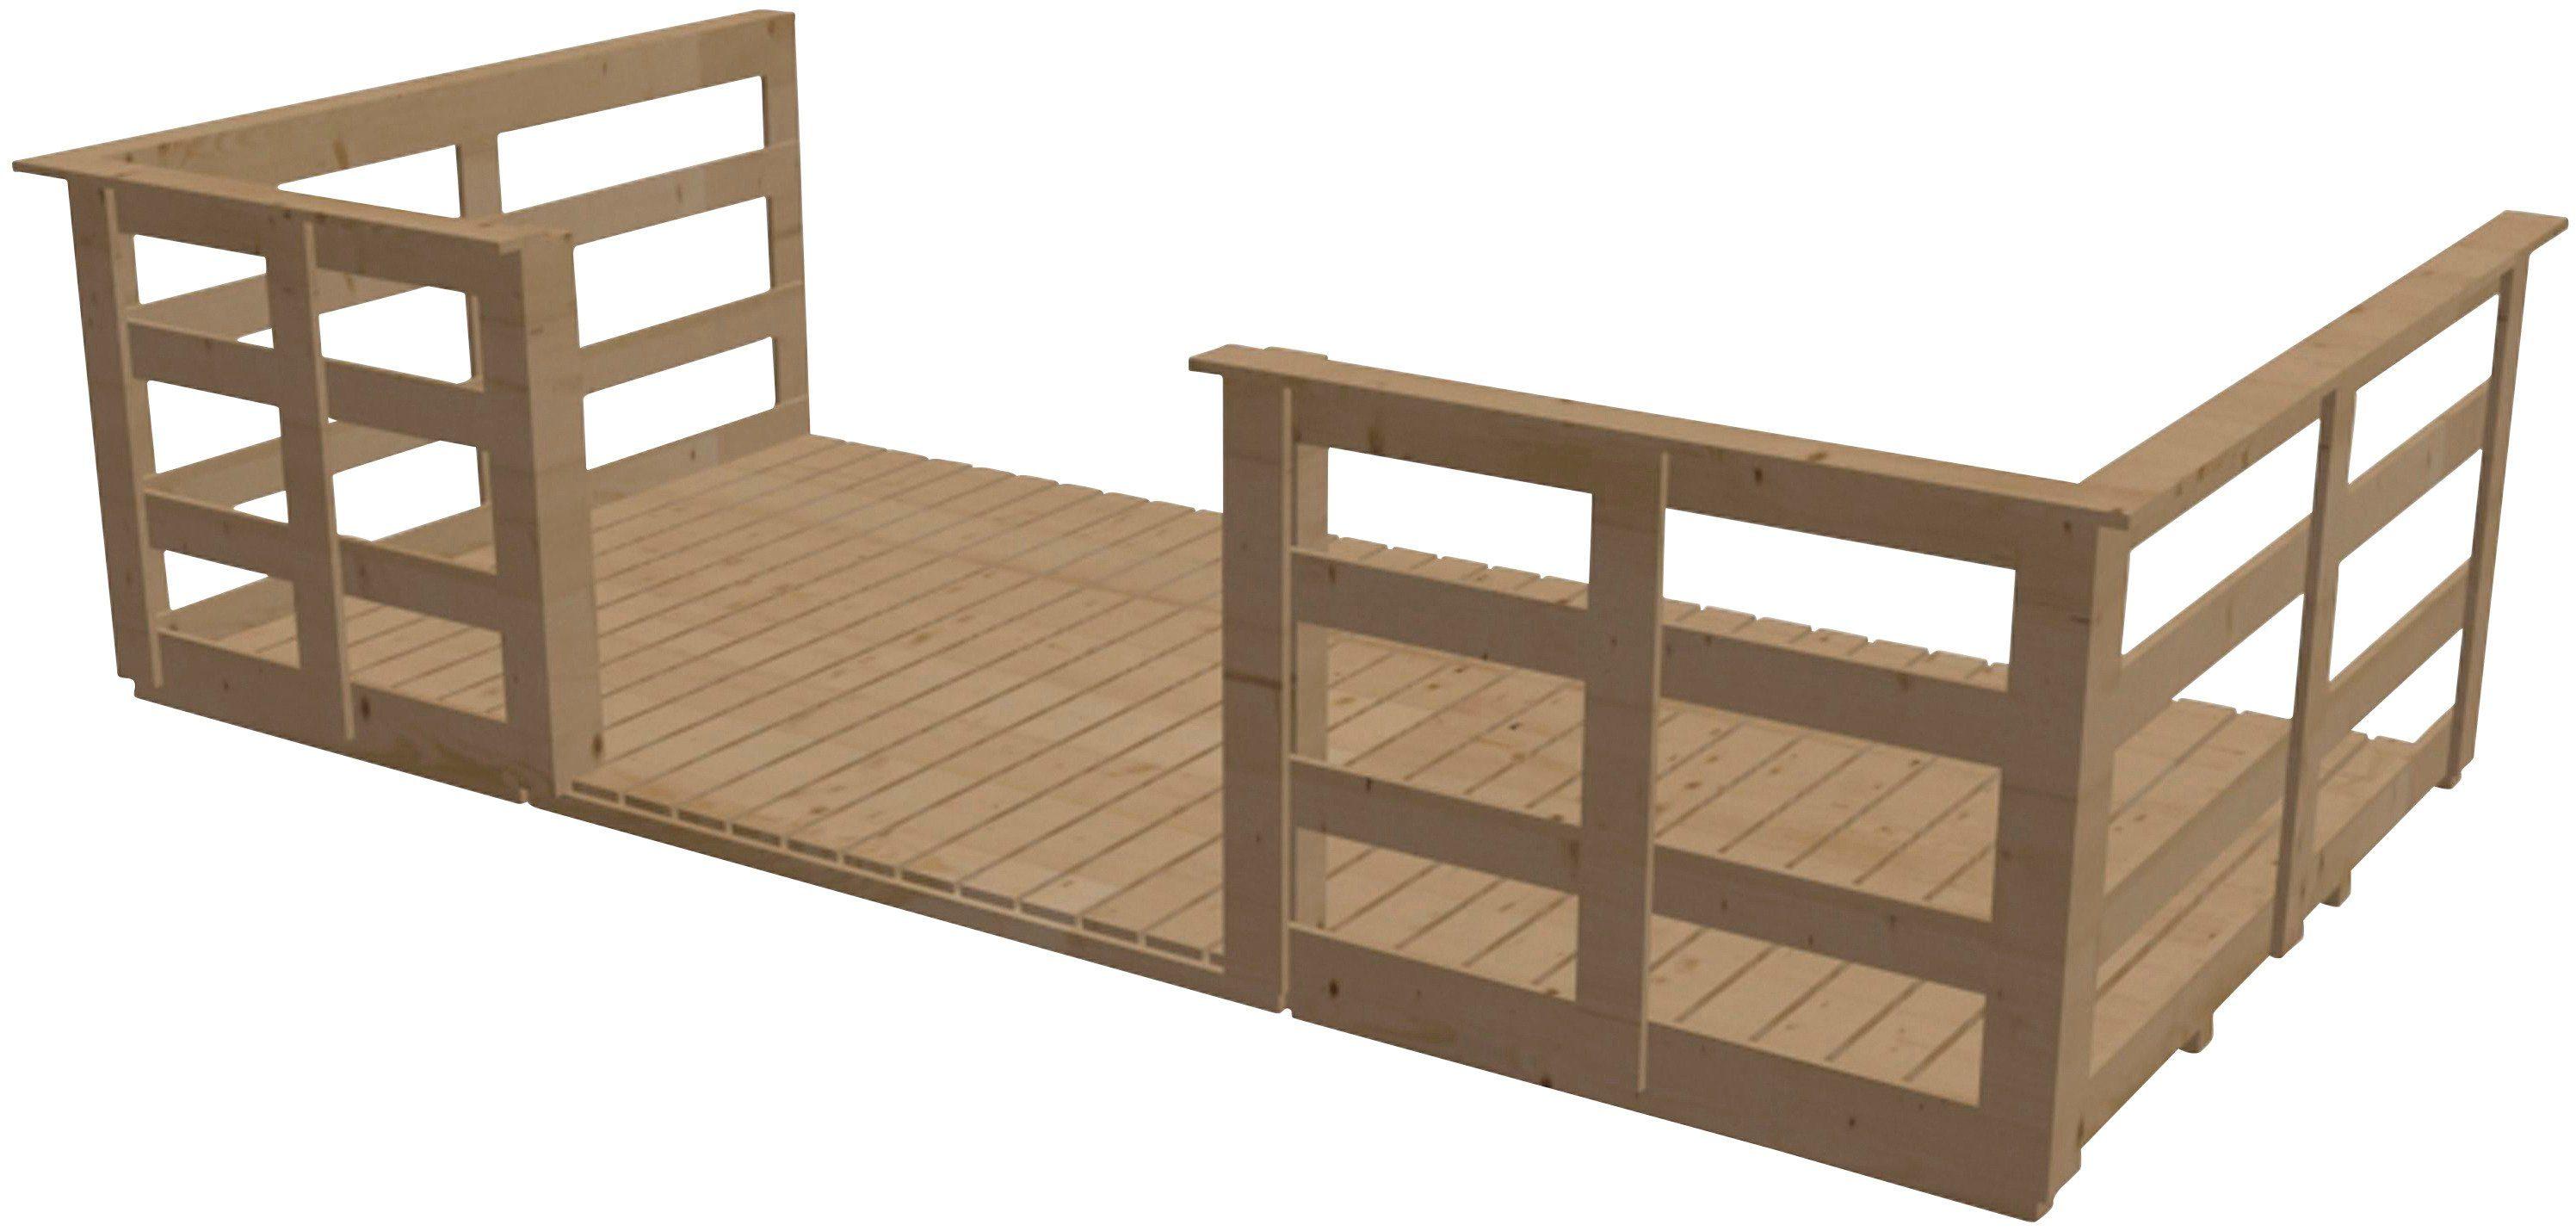 KARIBU Terrasse , 150 cm Tiefe, für Karibu-Produkte